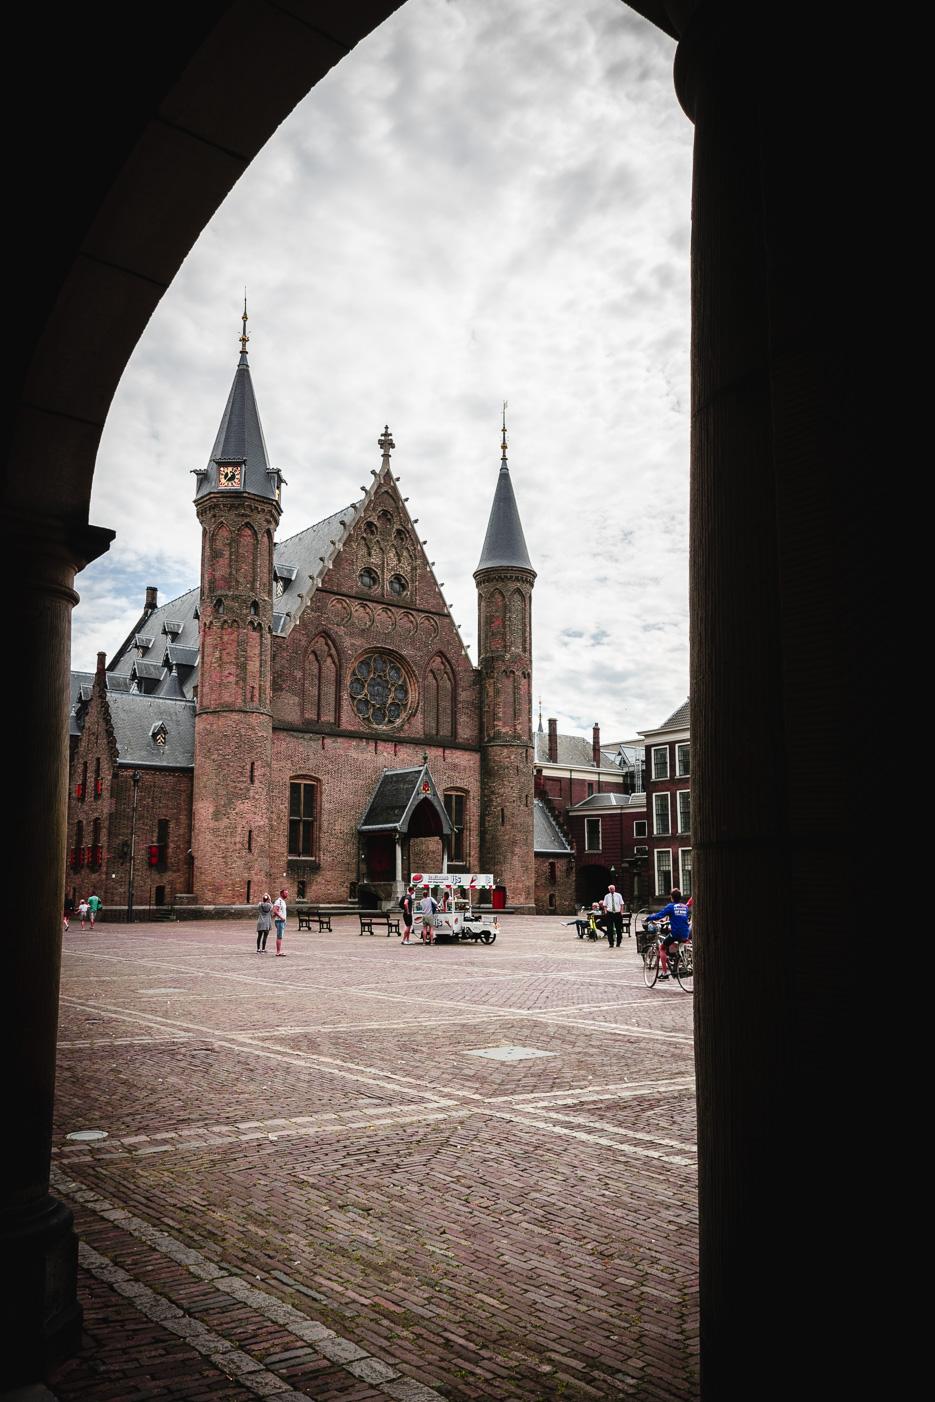 rittersaal ridderzaal den haag het binnenhof tipps sehenswürdigkeiten